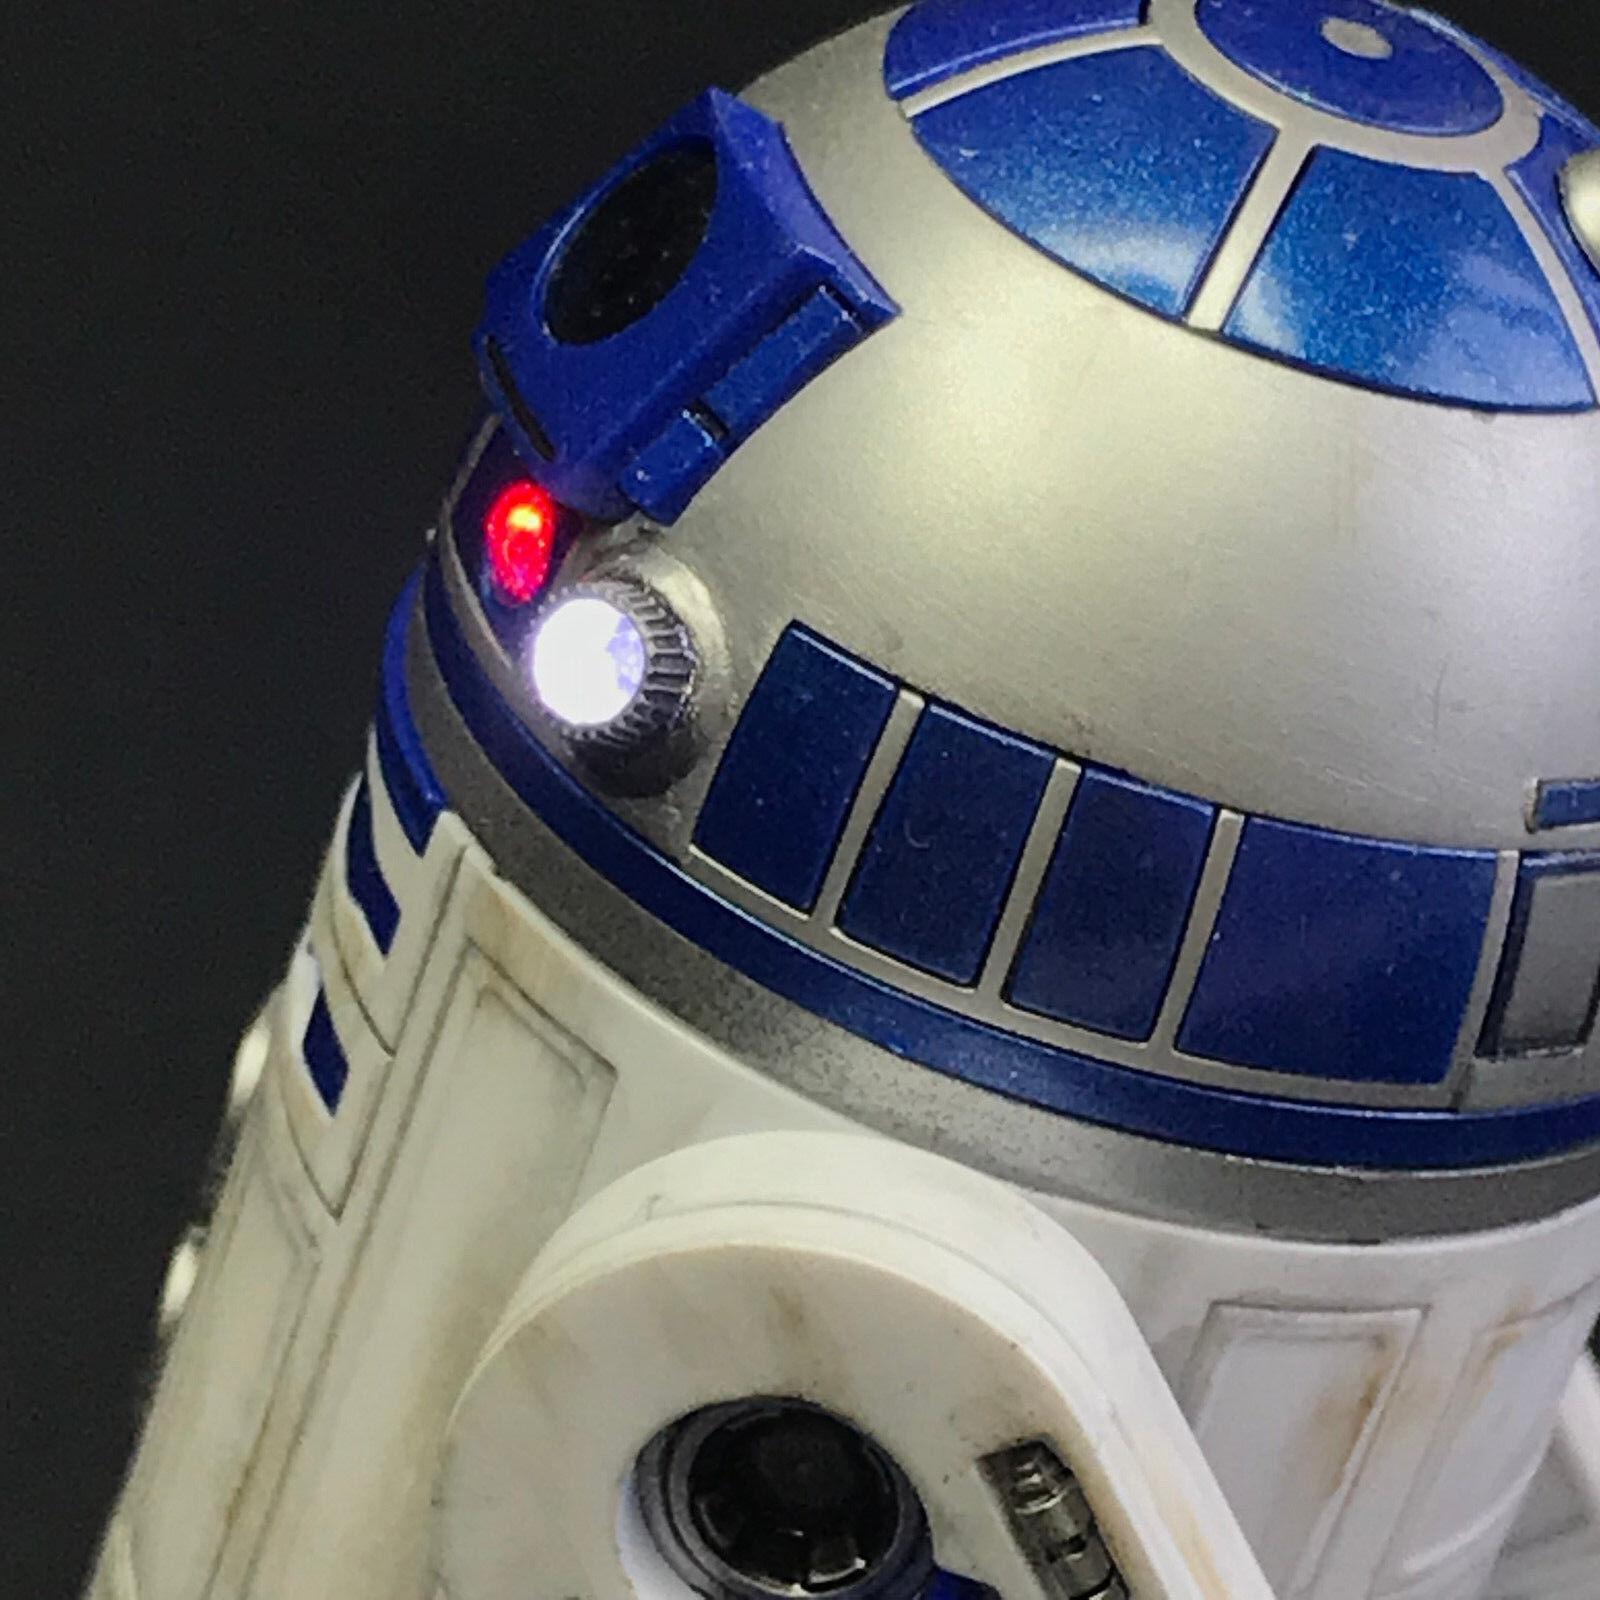 *LIGHTING KIT ONLY* for Bandai 1/12 Star Wars R2-D2 Astromech Droid Figure